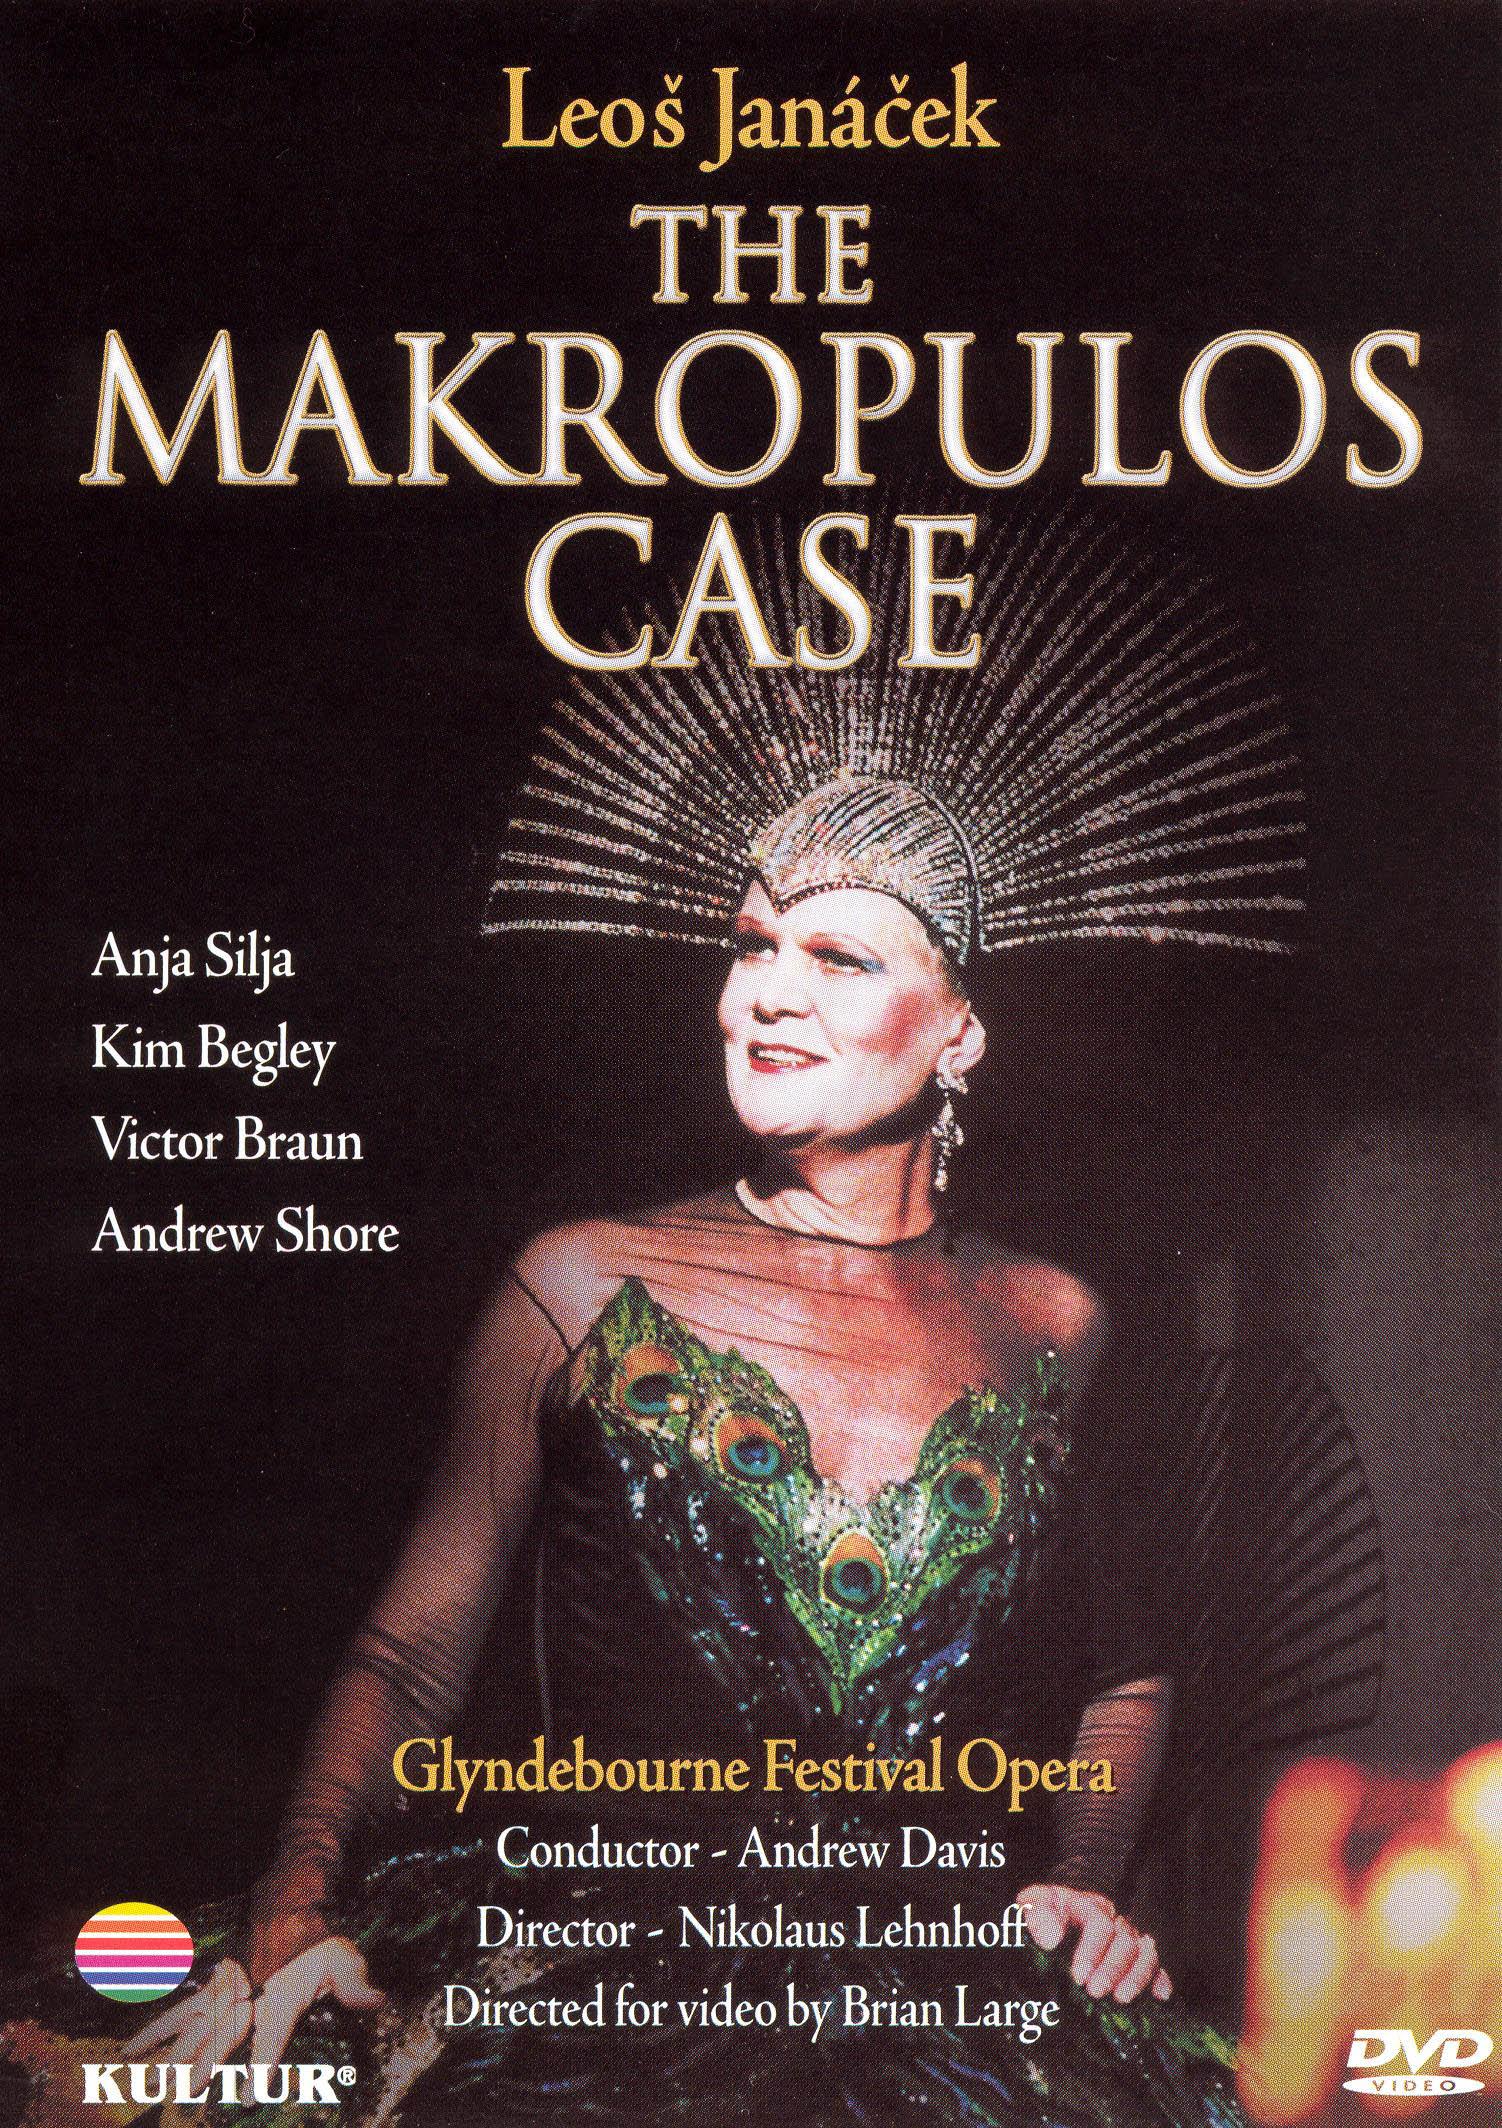 The Makropulos Case (Glyndebourne Festival Opera)